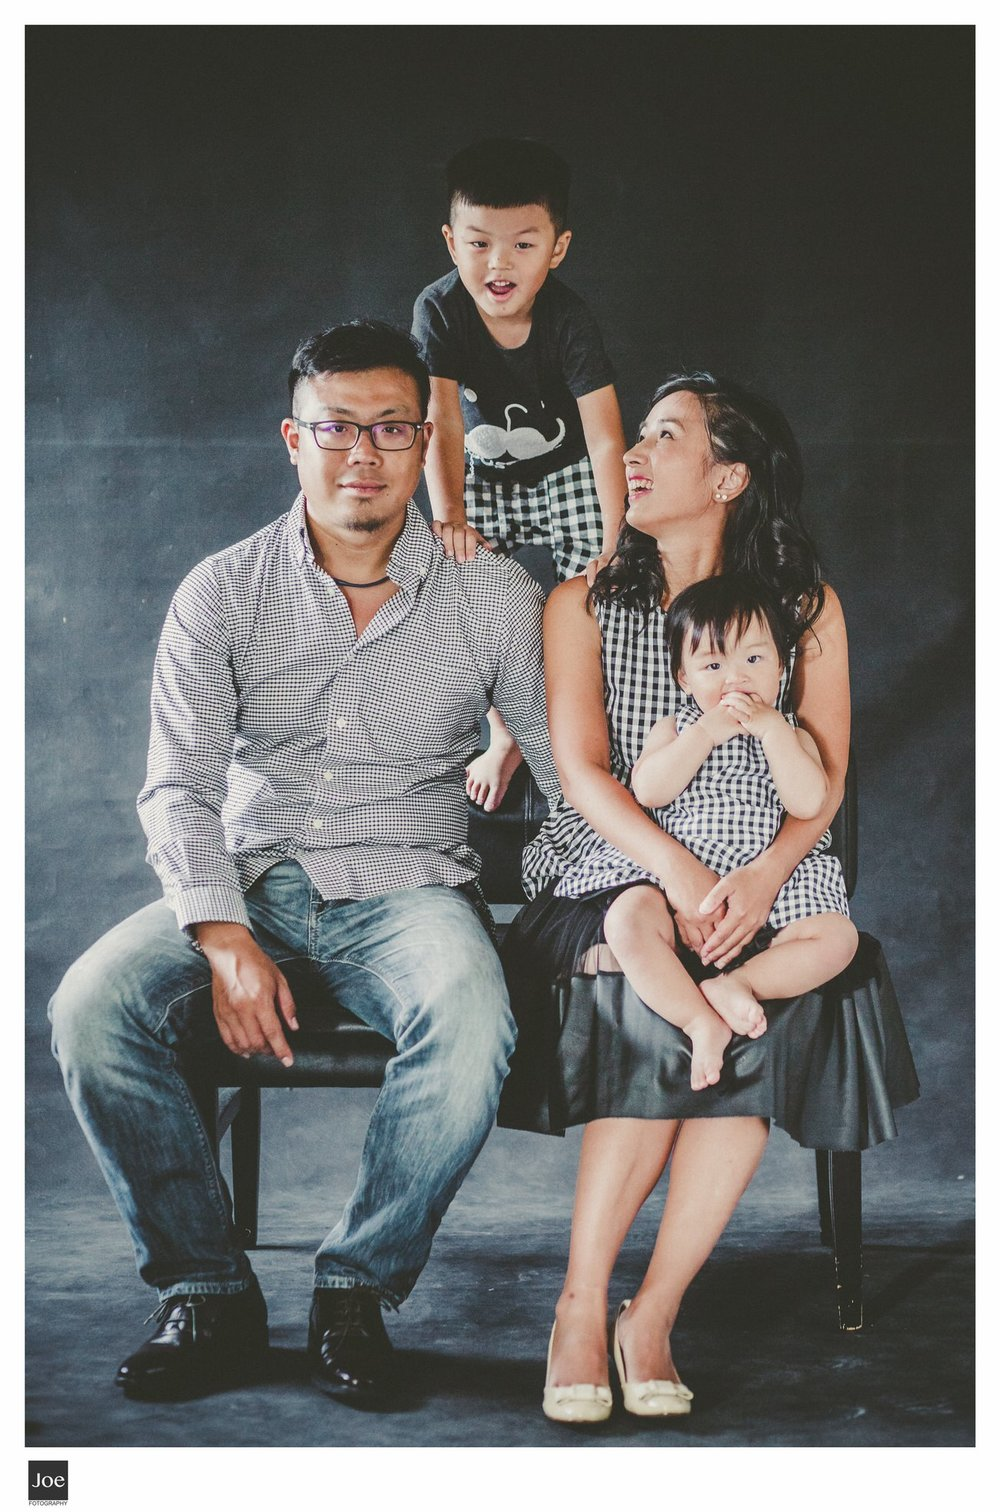 joe-fotography-family-photo-pepper-salt-bowtie-013.jpg